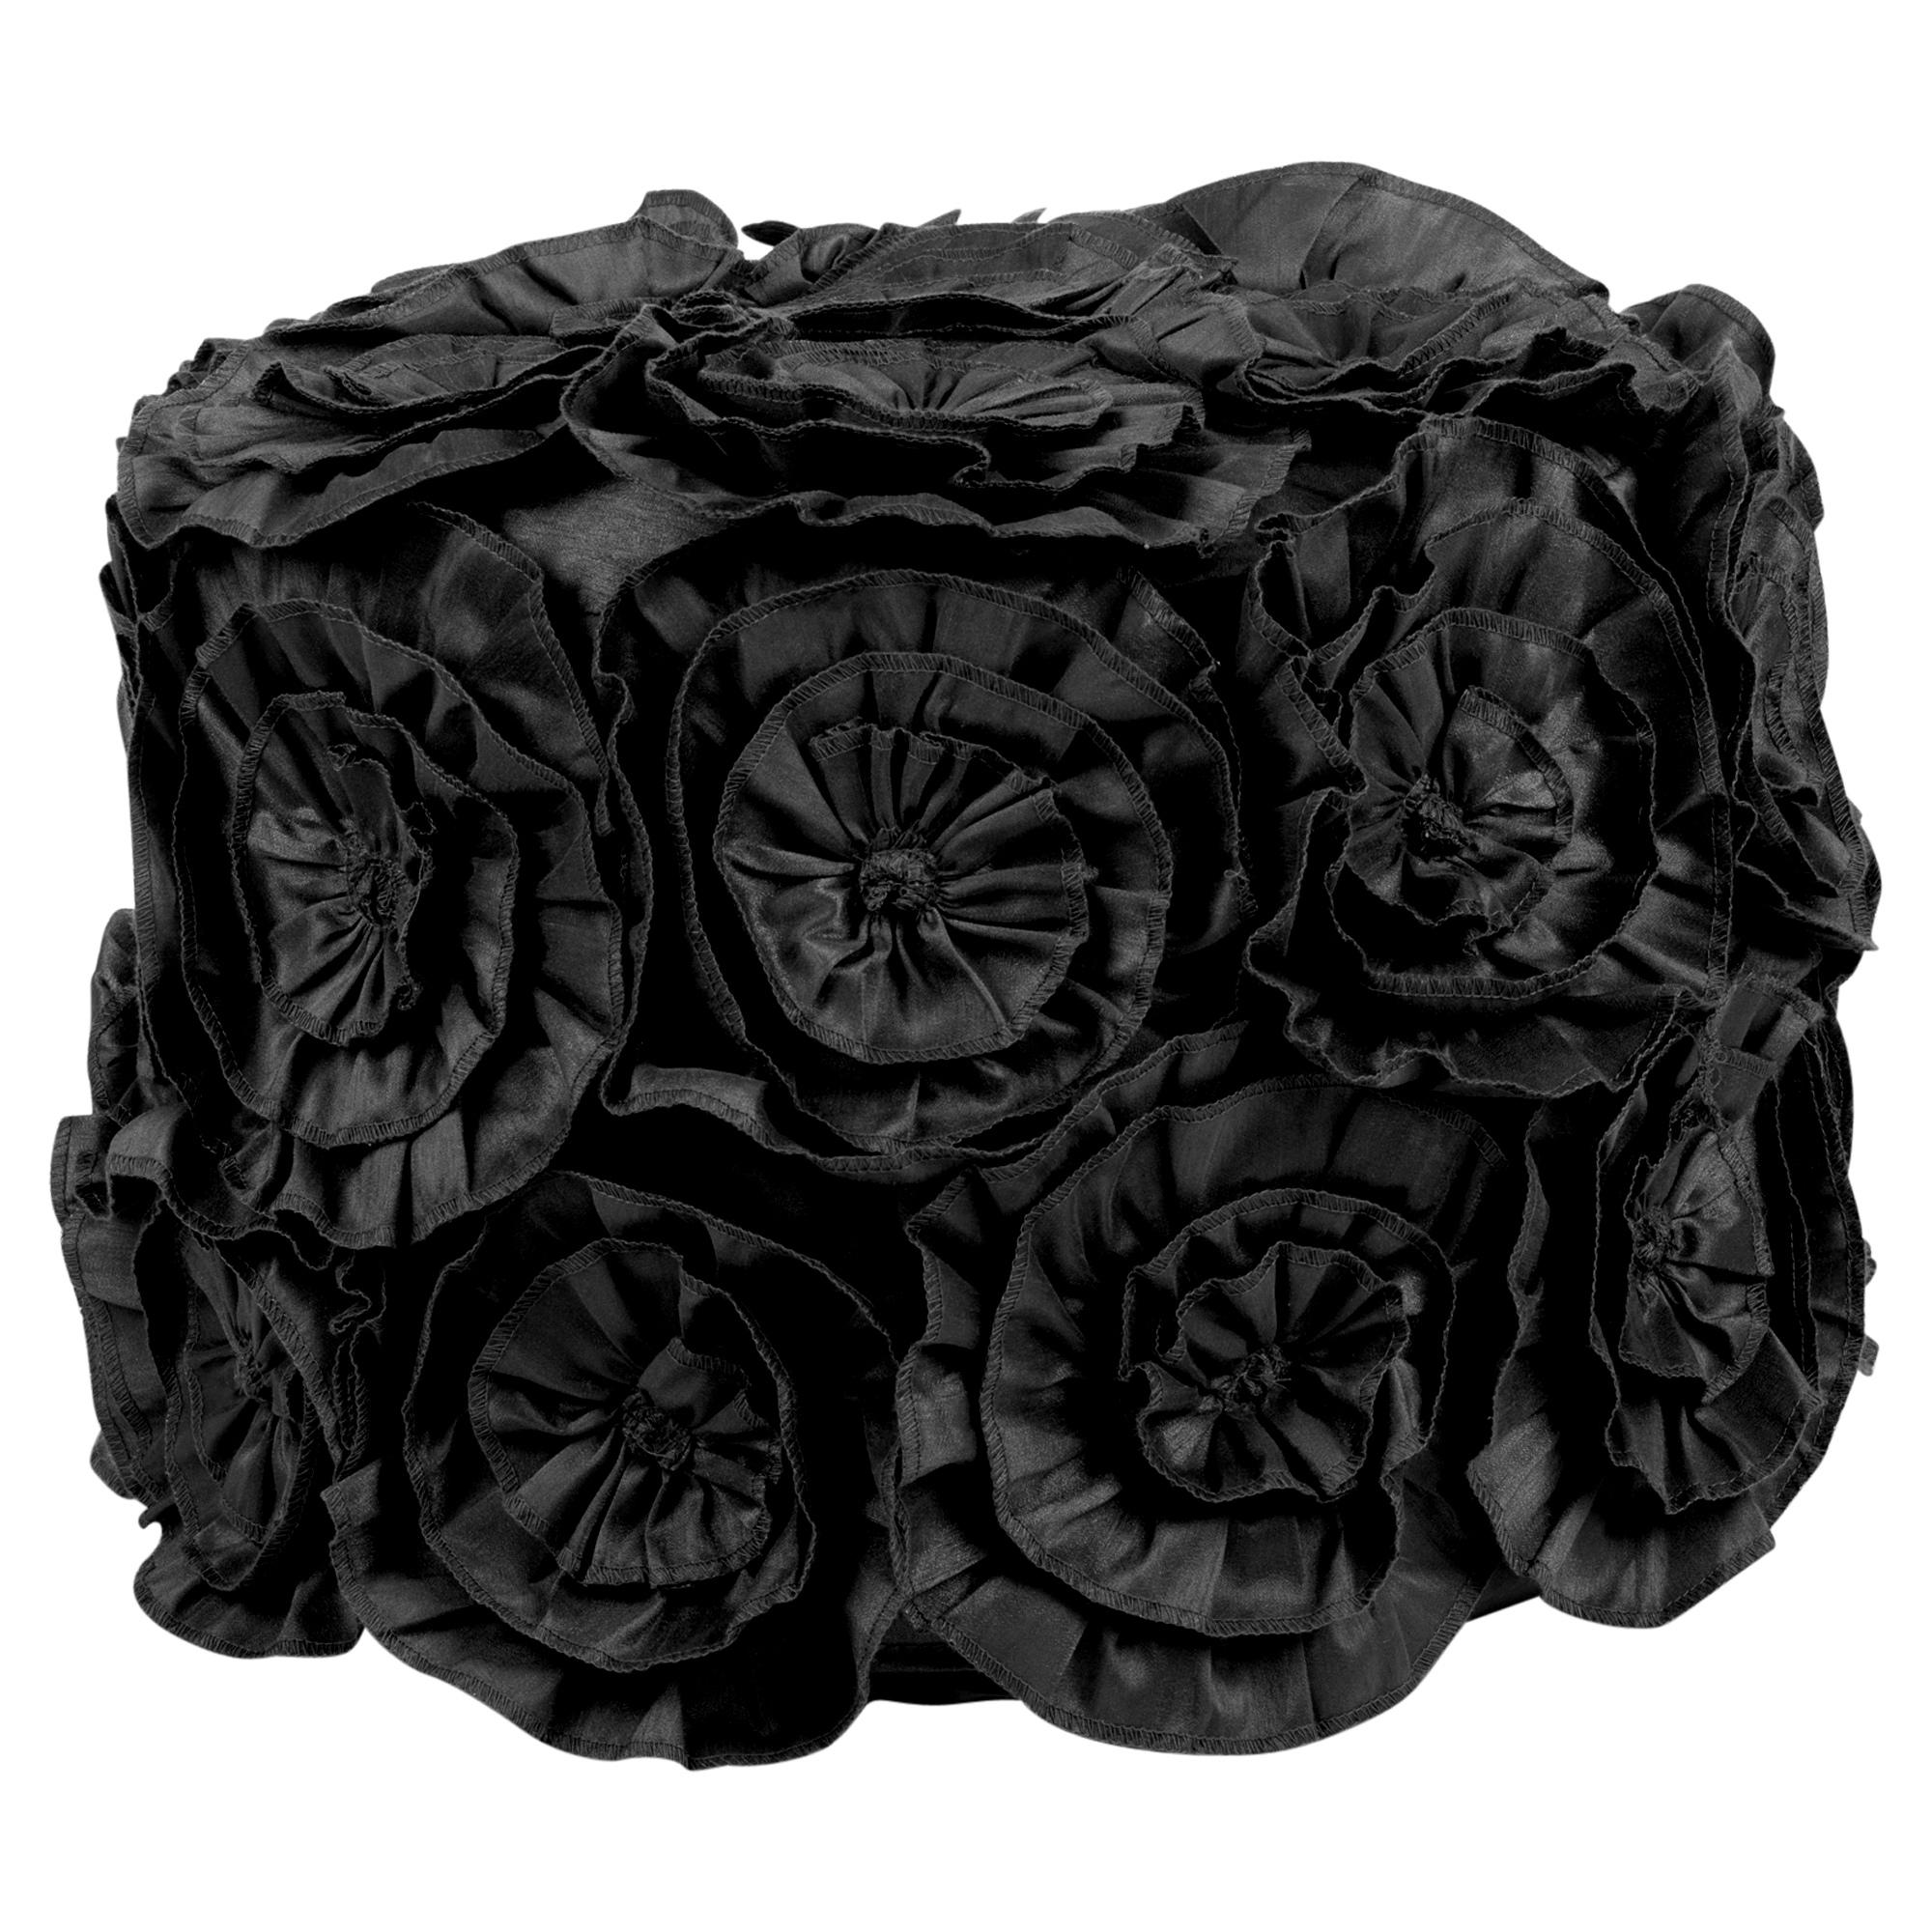 grand 40cm gros rond pouf si ge doux repos marocain pouf echelle tabouret ebay. Black Bedroom Furniture Sets. Home Design Ideas